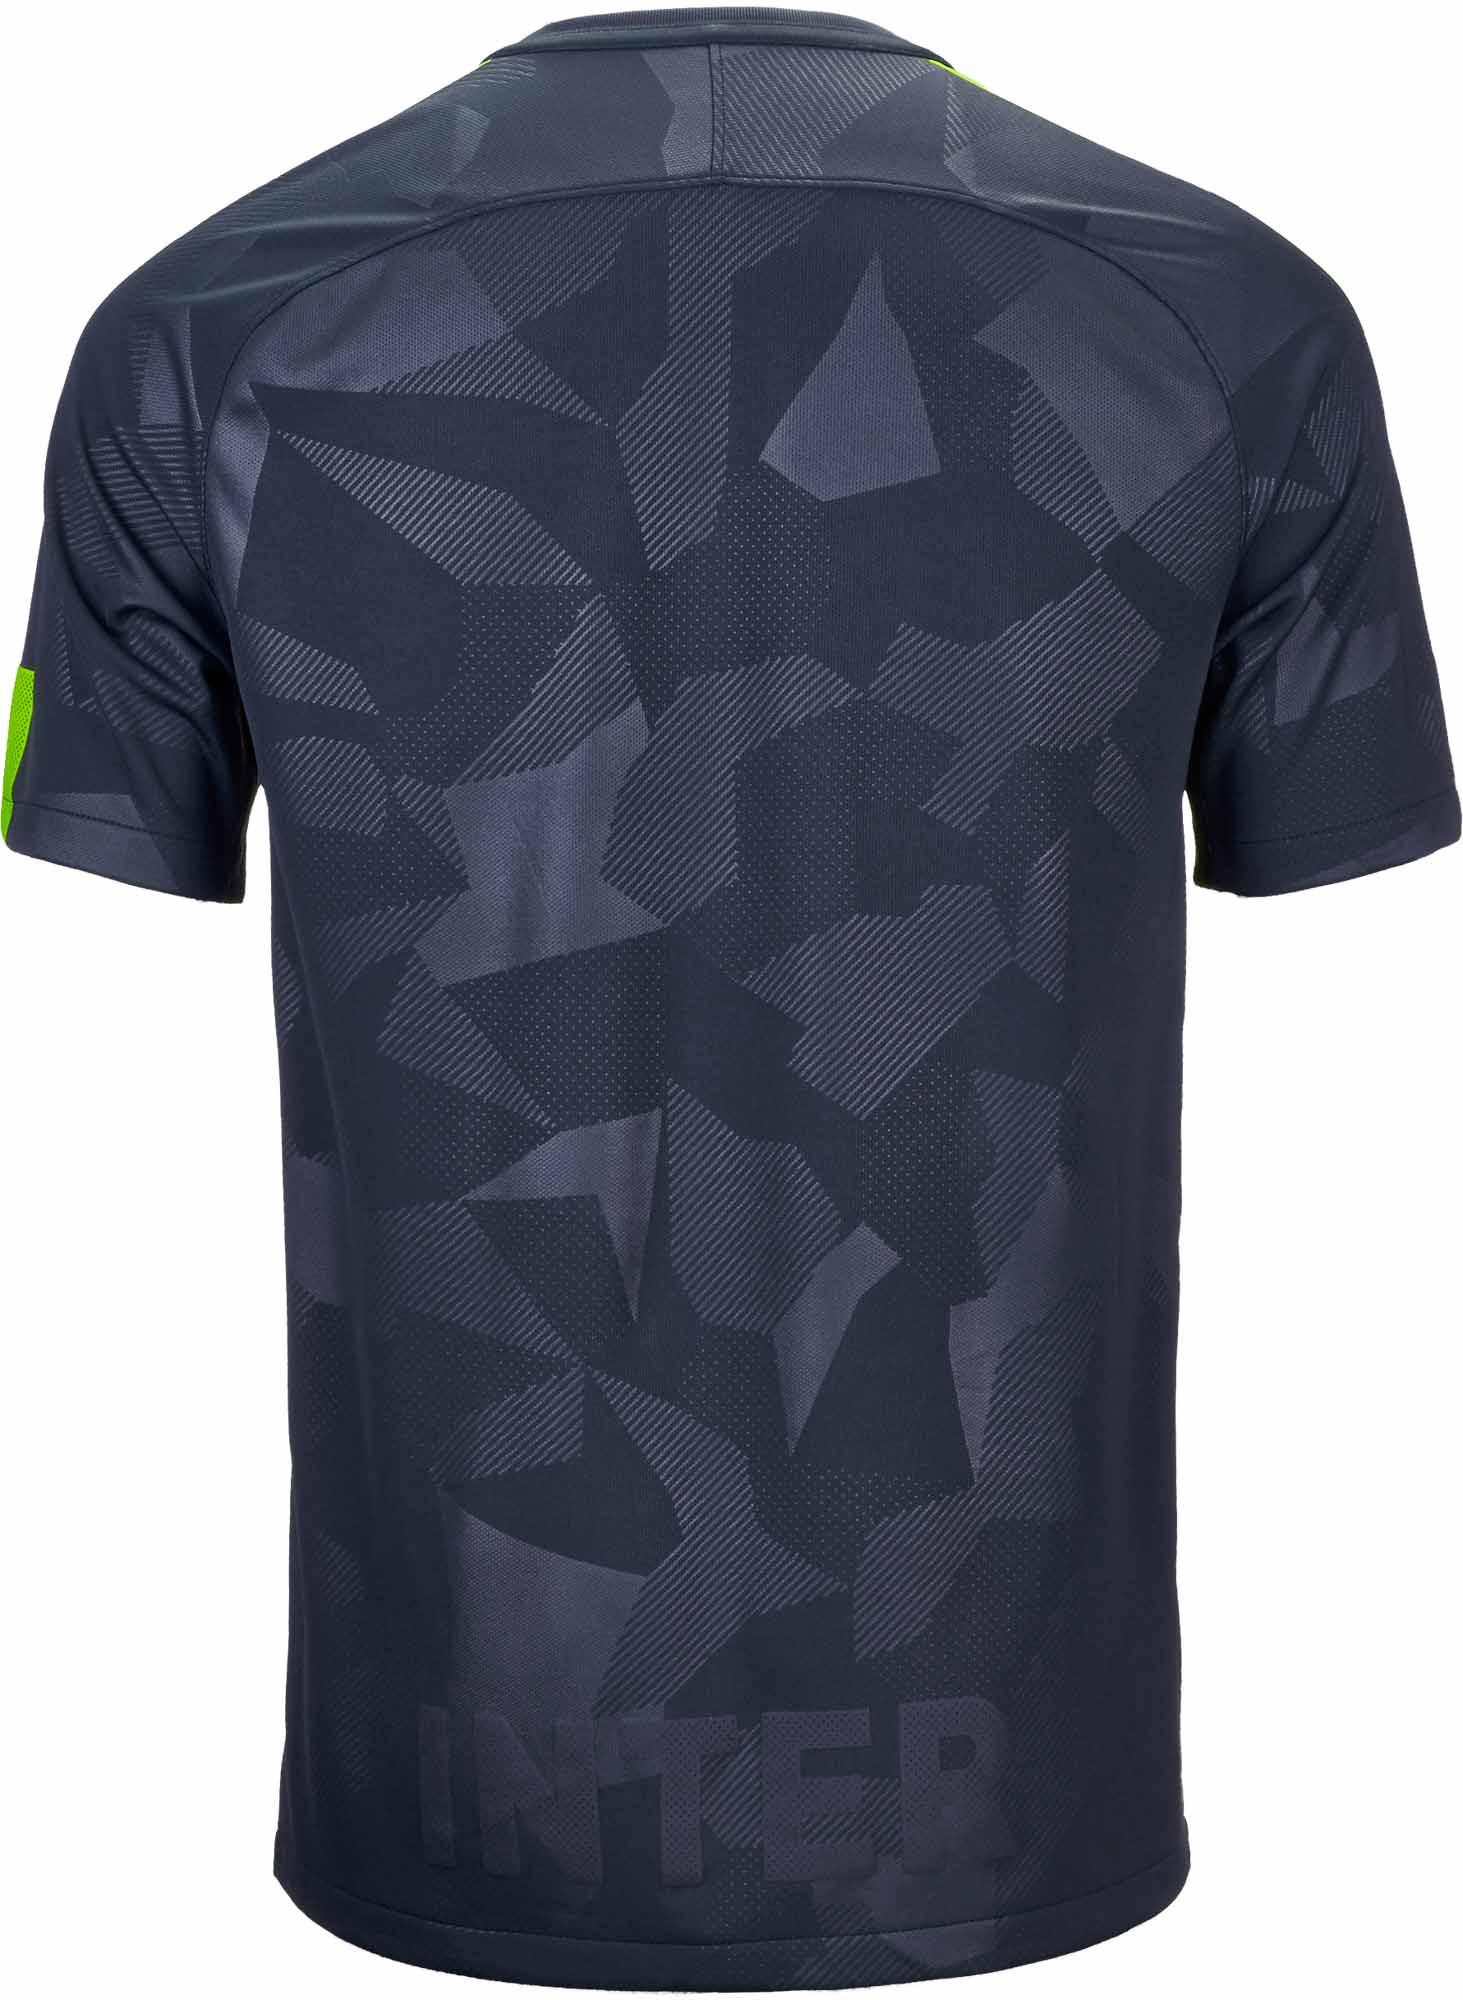 hot sale online 32376 22ff8 Nike Inter Milan 3rd Jersey 2017-18 - Soccer Master